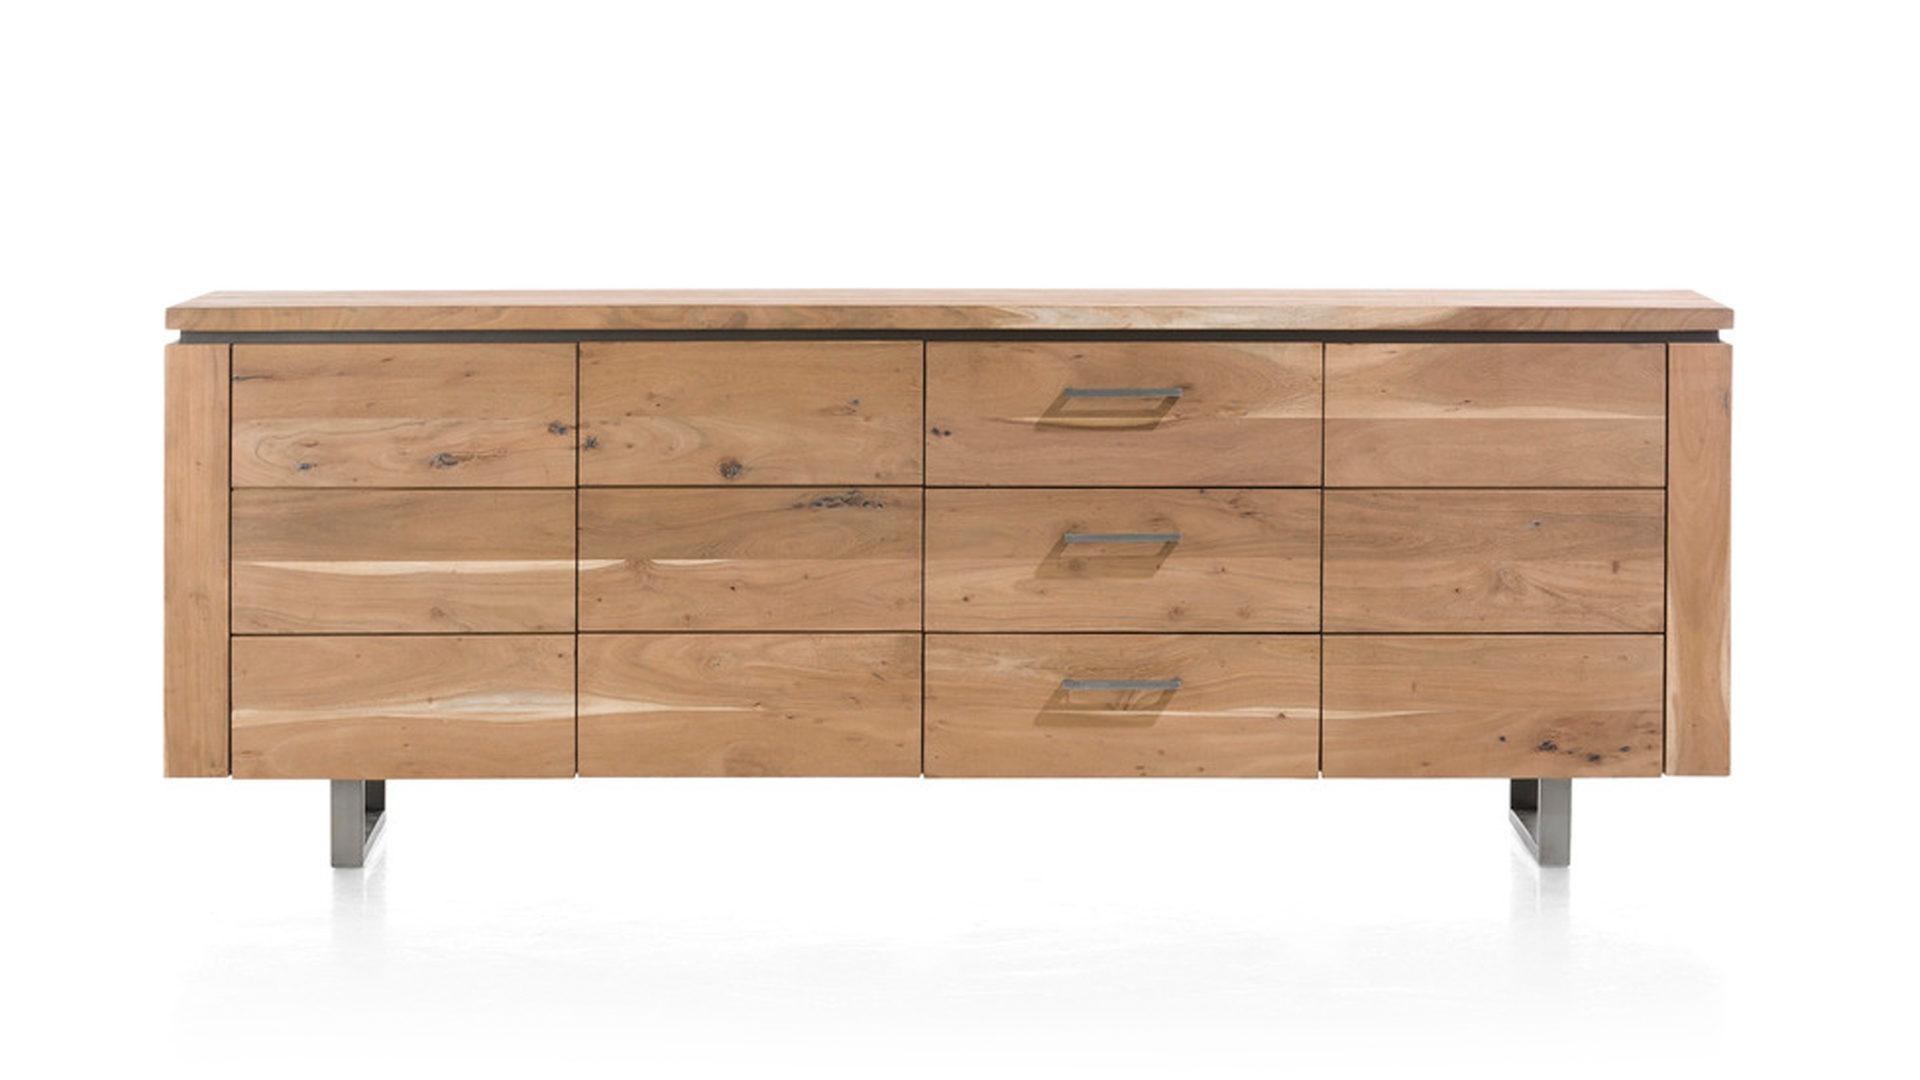 Möbel Boer Coesfeld | Räume | Badezimmer | Schränke | Sideboard, Badezimmer  Ideen